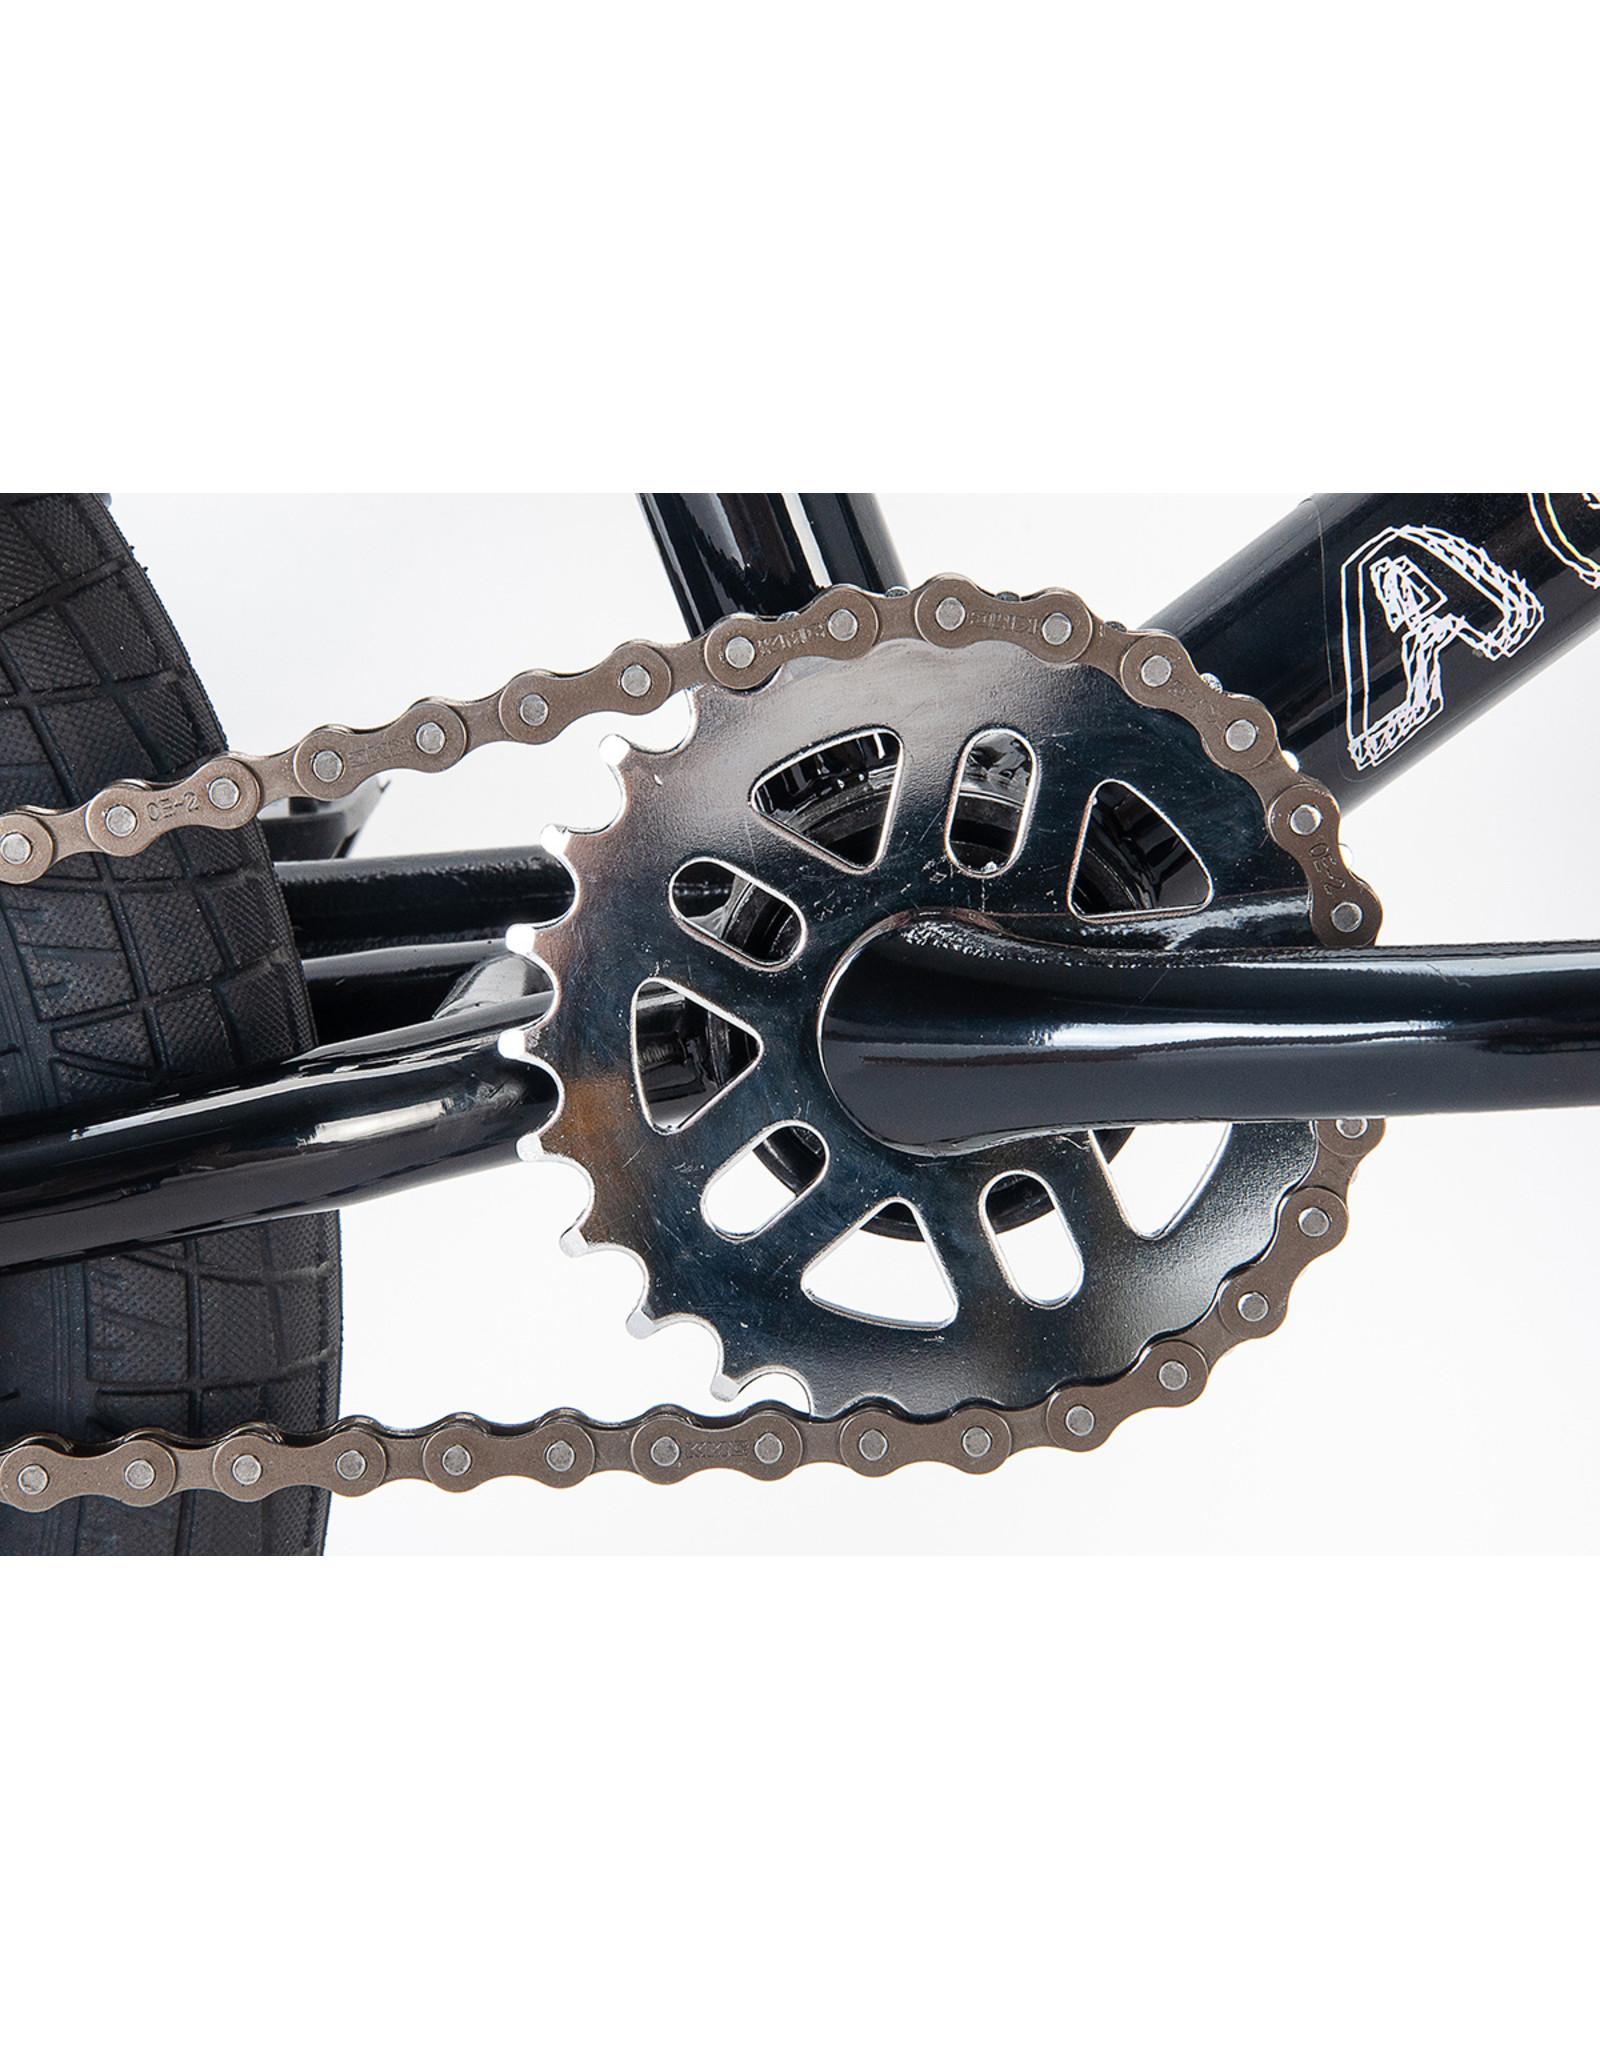 "ACADEMY ACADEMY '21 ORIGIN 16"" BMX GLOSS BLACK/POLISHED"